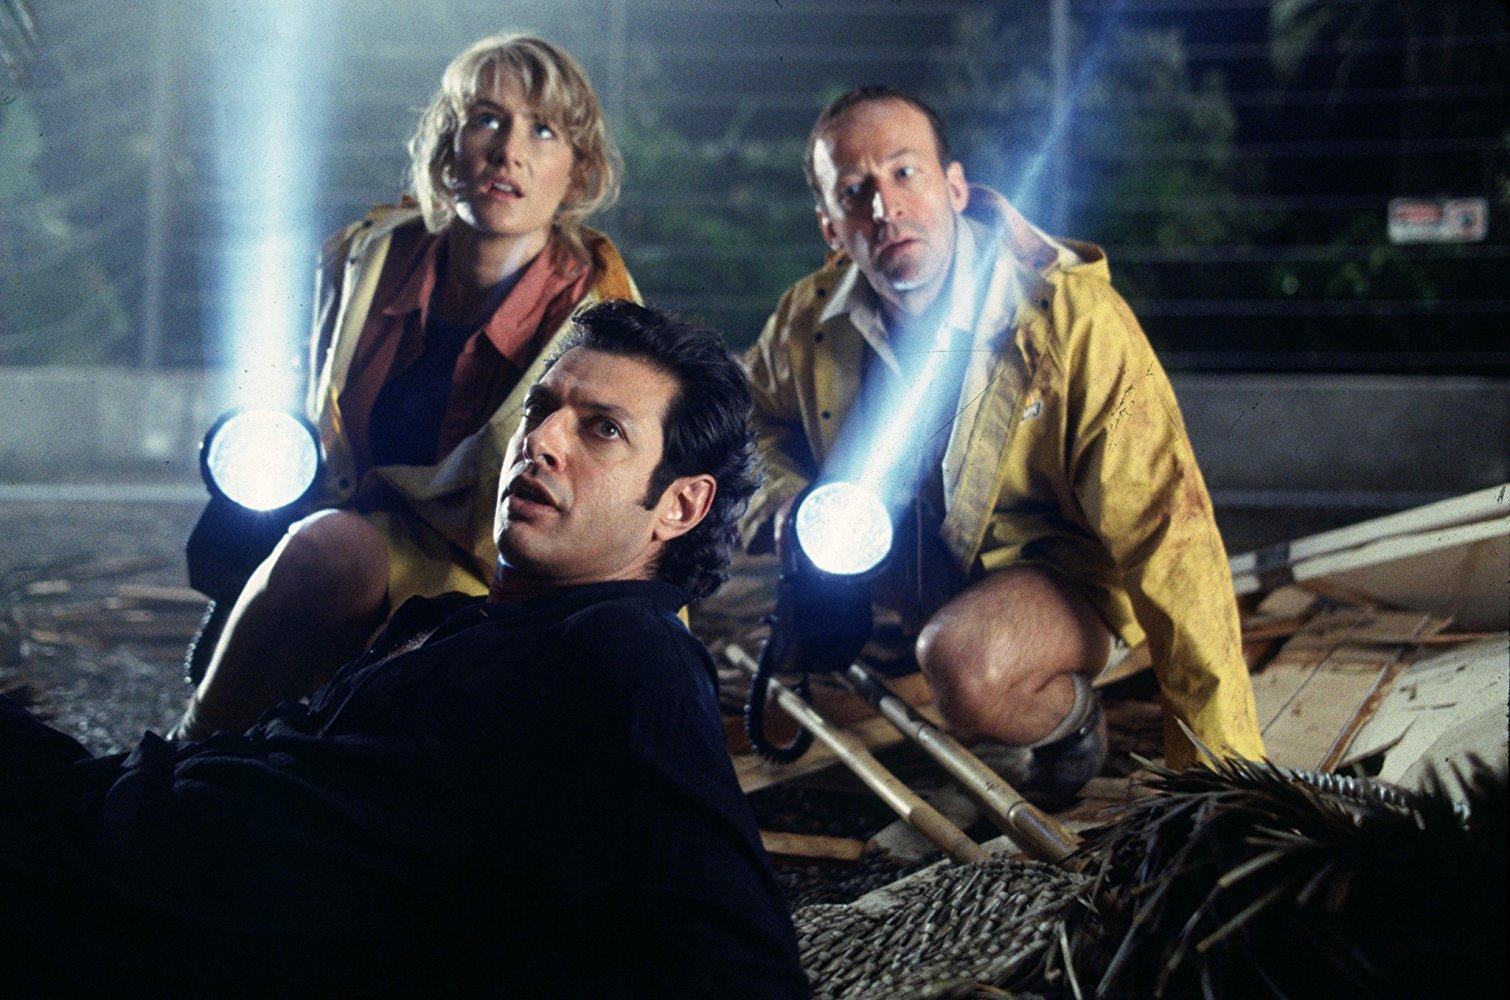 Laura Dern, Jeff Goldblum, and Bob Peck in JURASSIC PARK (1993)